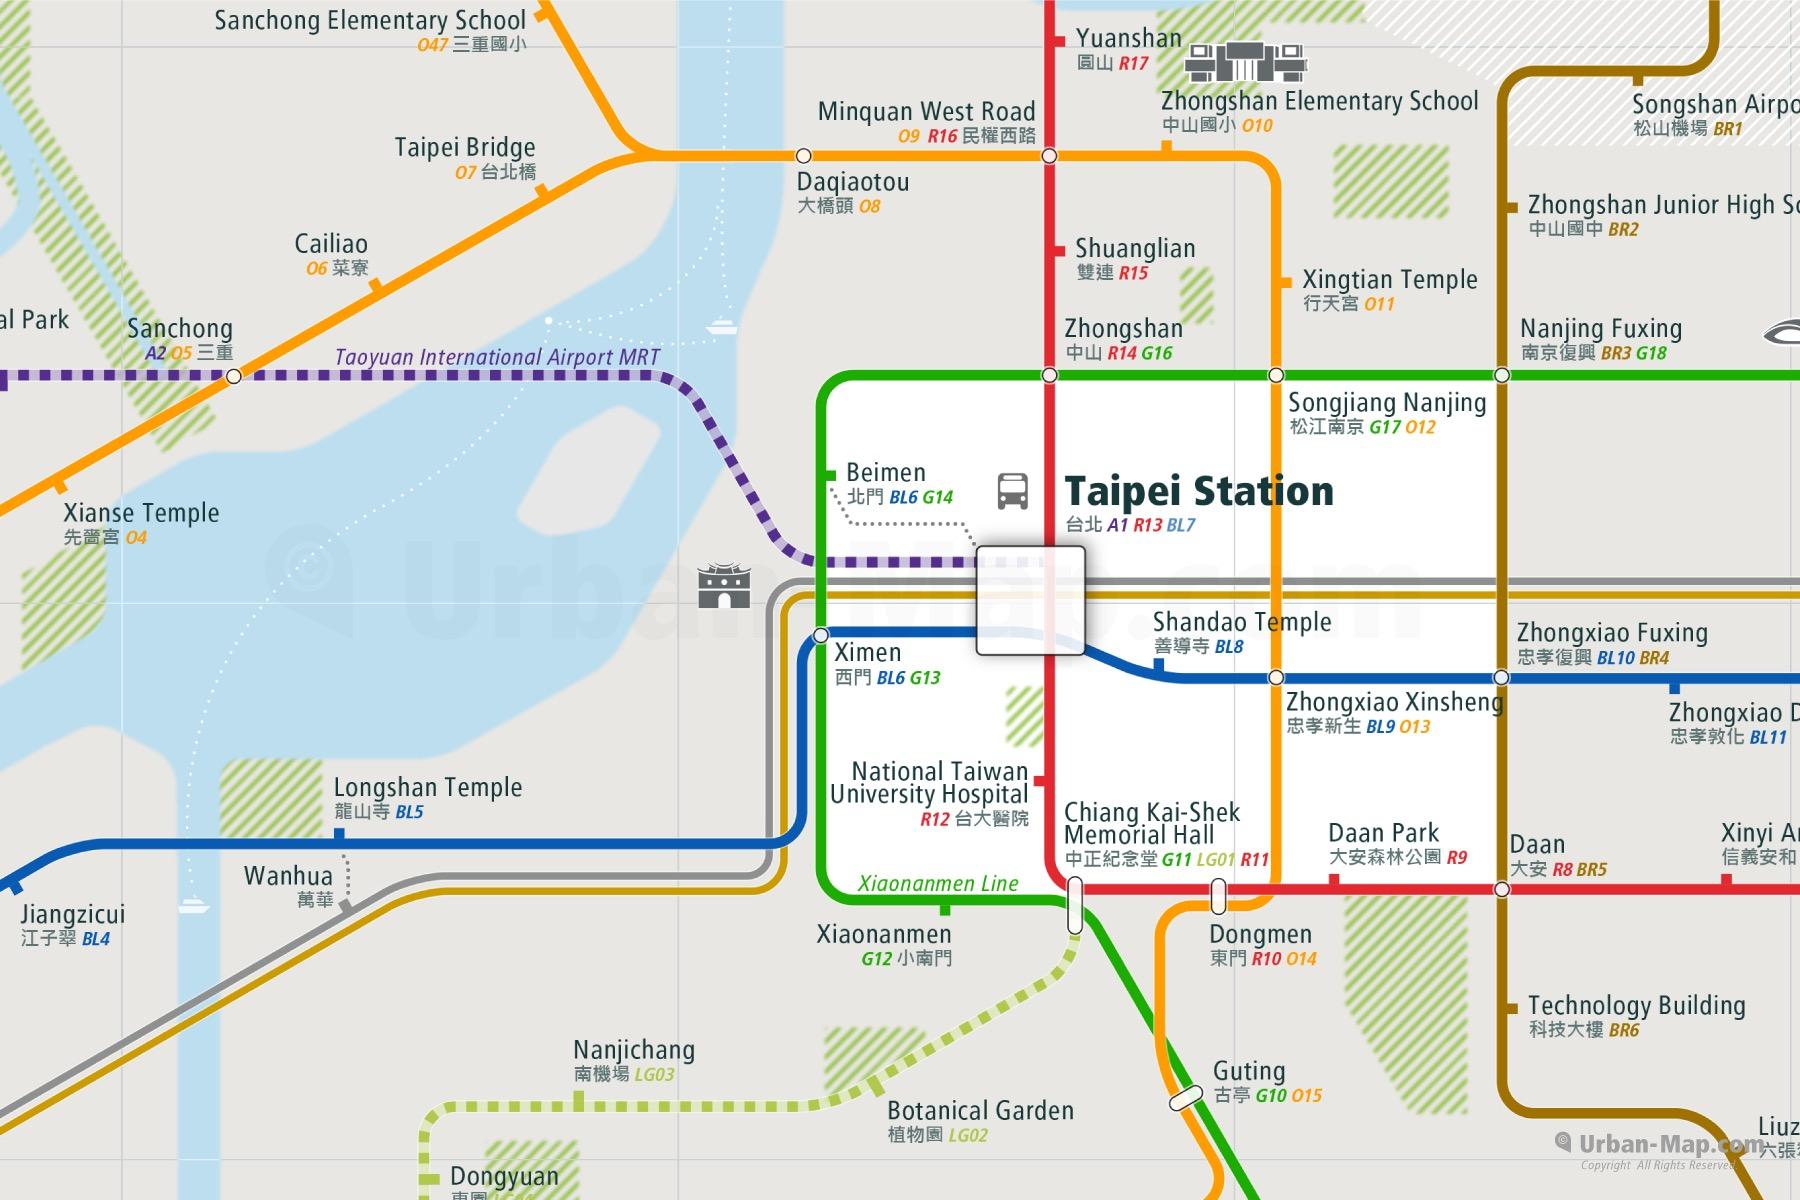 Subway Map Taipei.Taipei Rail Map A Smart City Guide Map Even Offline